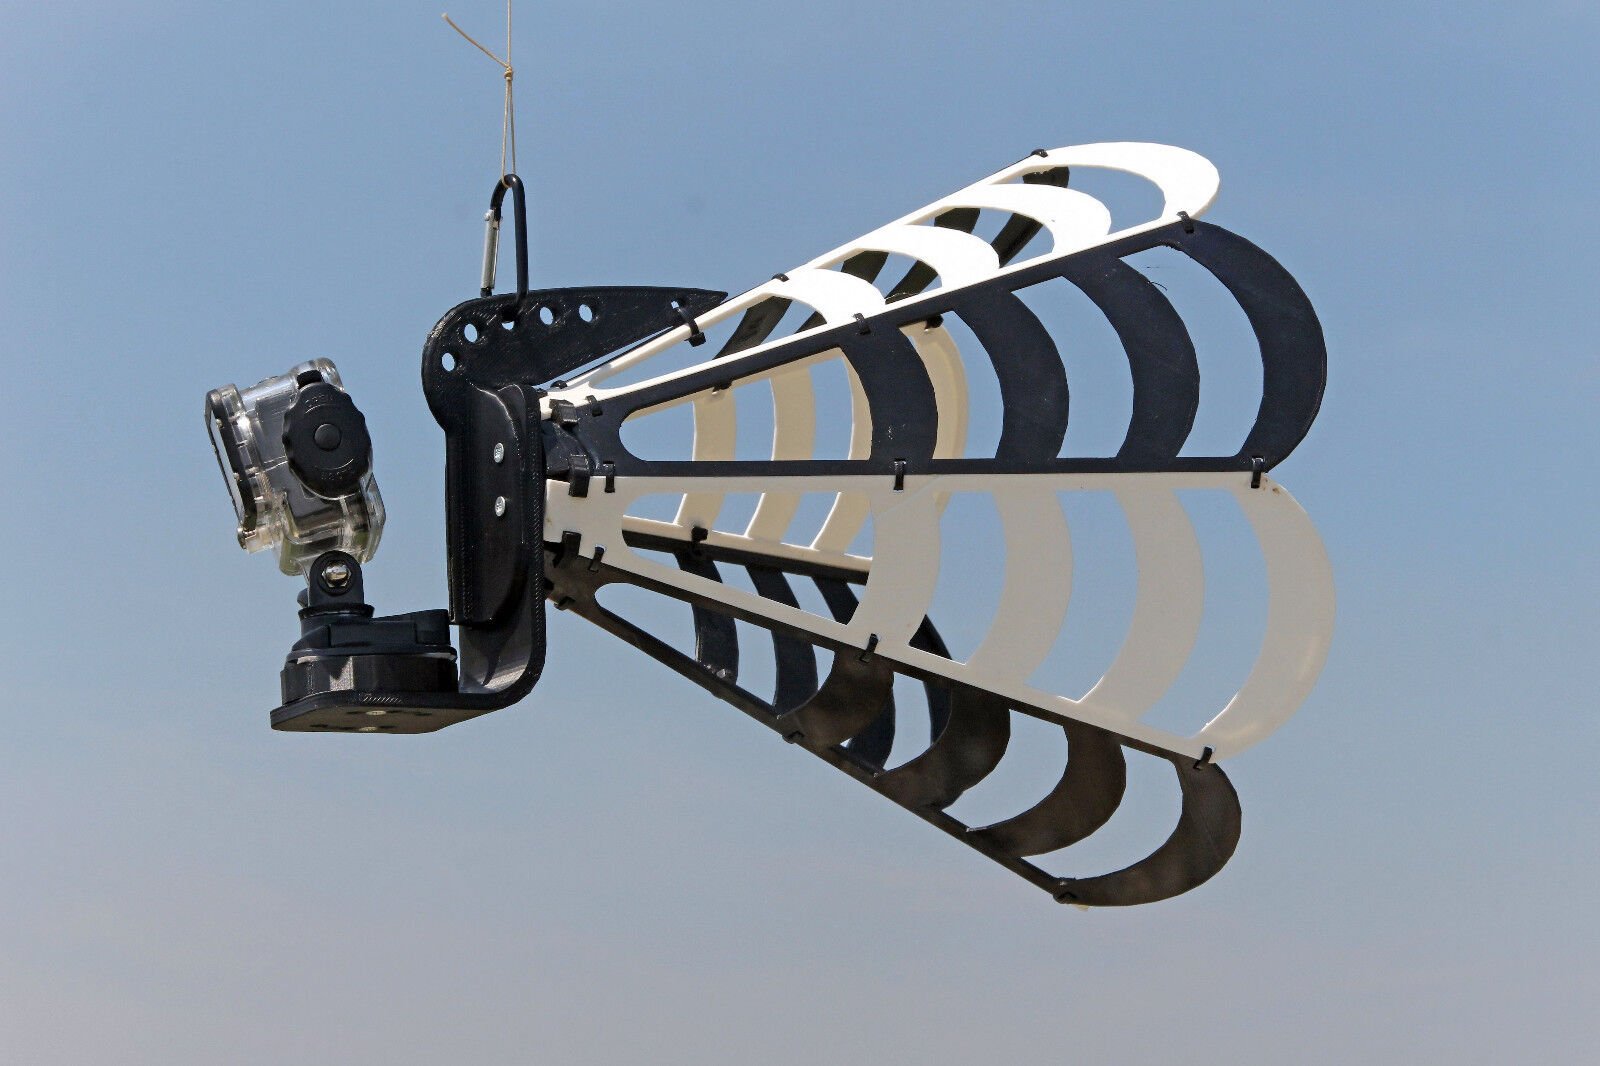 Spider v4  chase cam for Paragliding Paramotor PPG